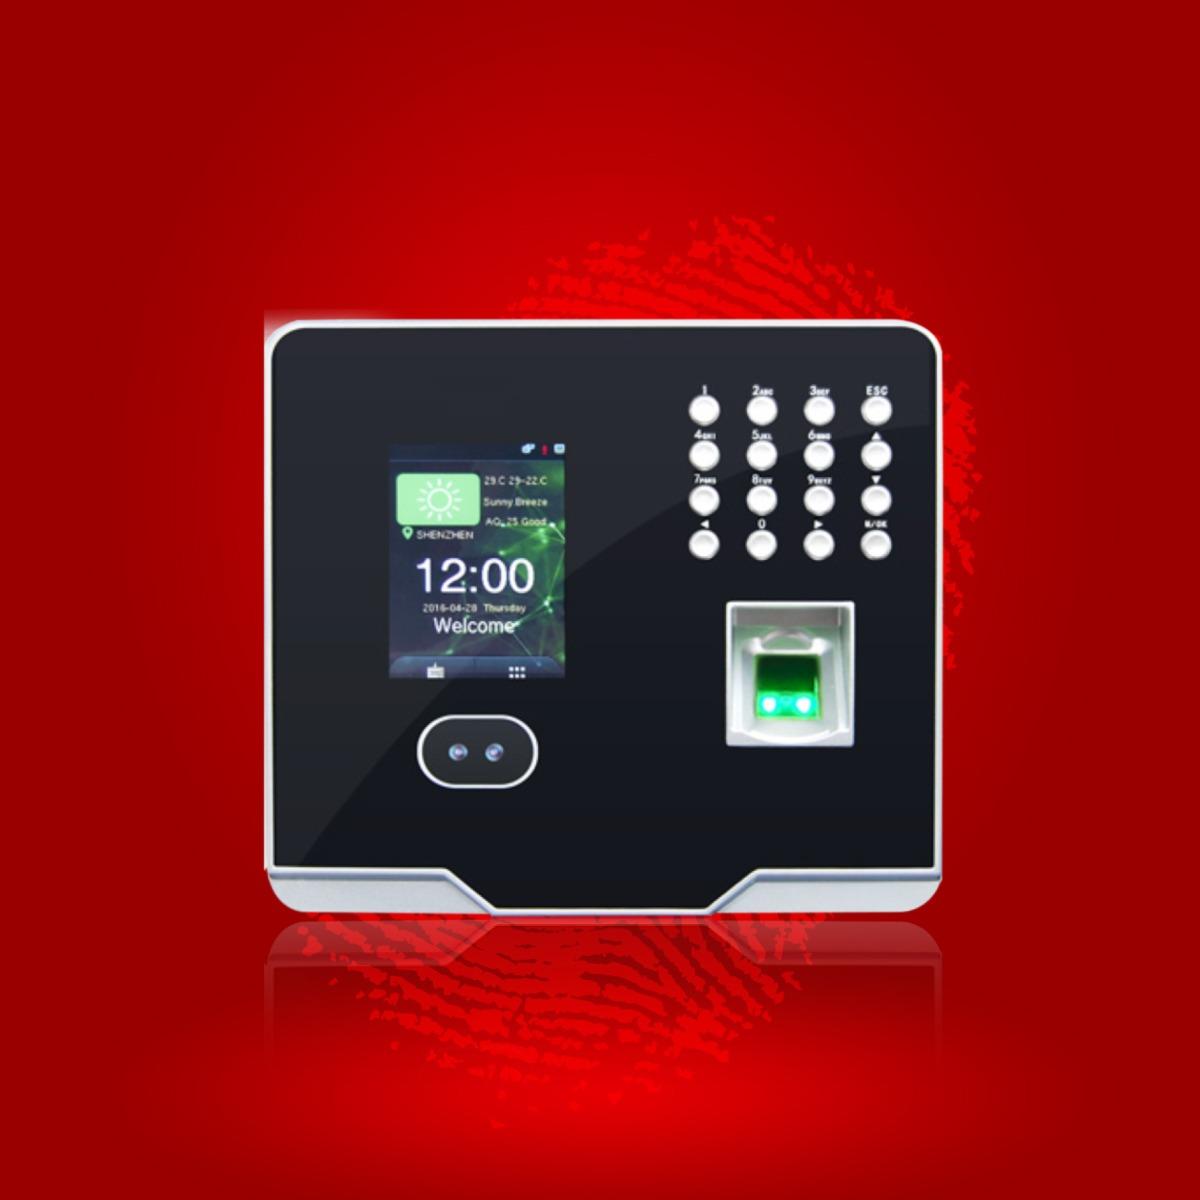 Reloj Biometrico Stylus 680